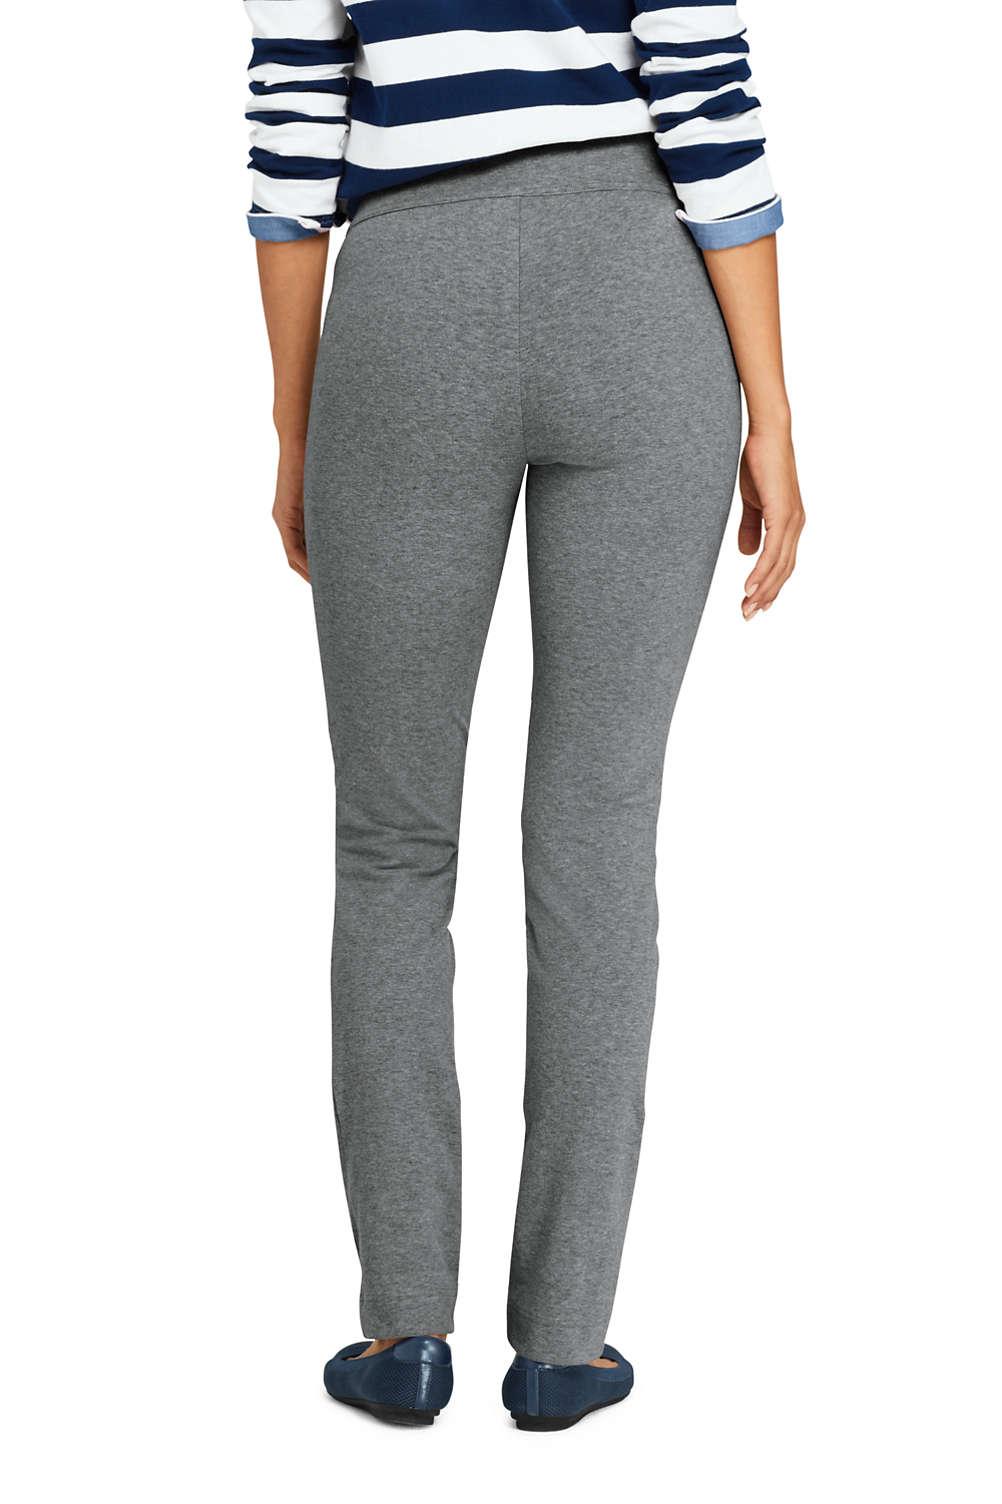 27e61d7fd6877 Women s Starfish Slim Leg Elastic Waist Pants Mid Rise